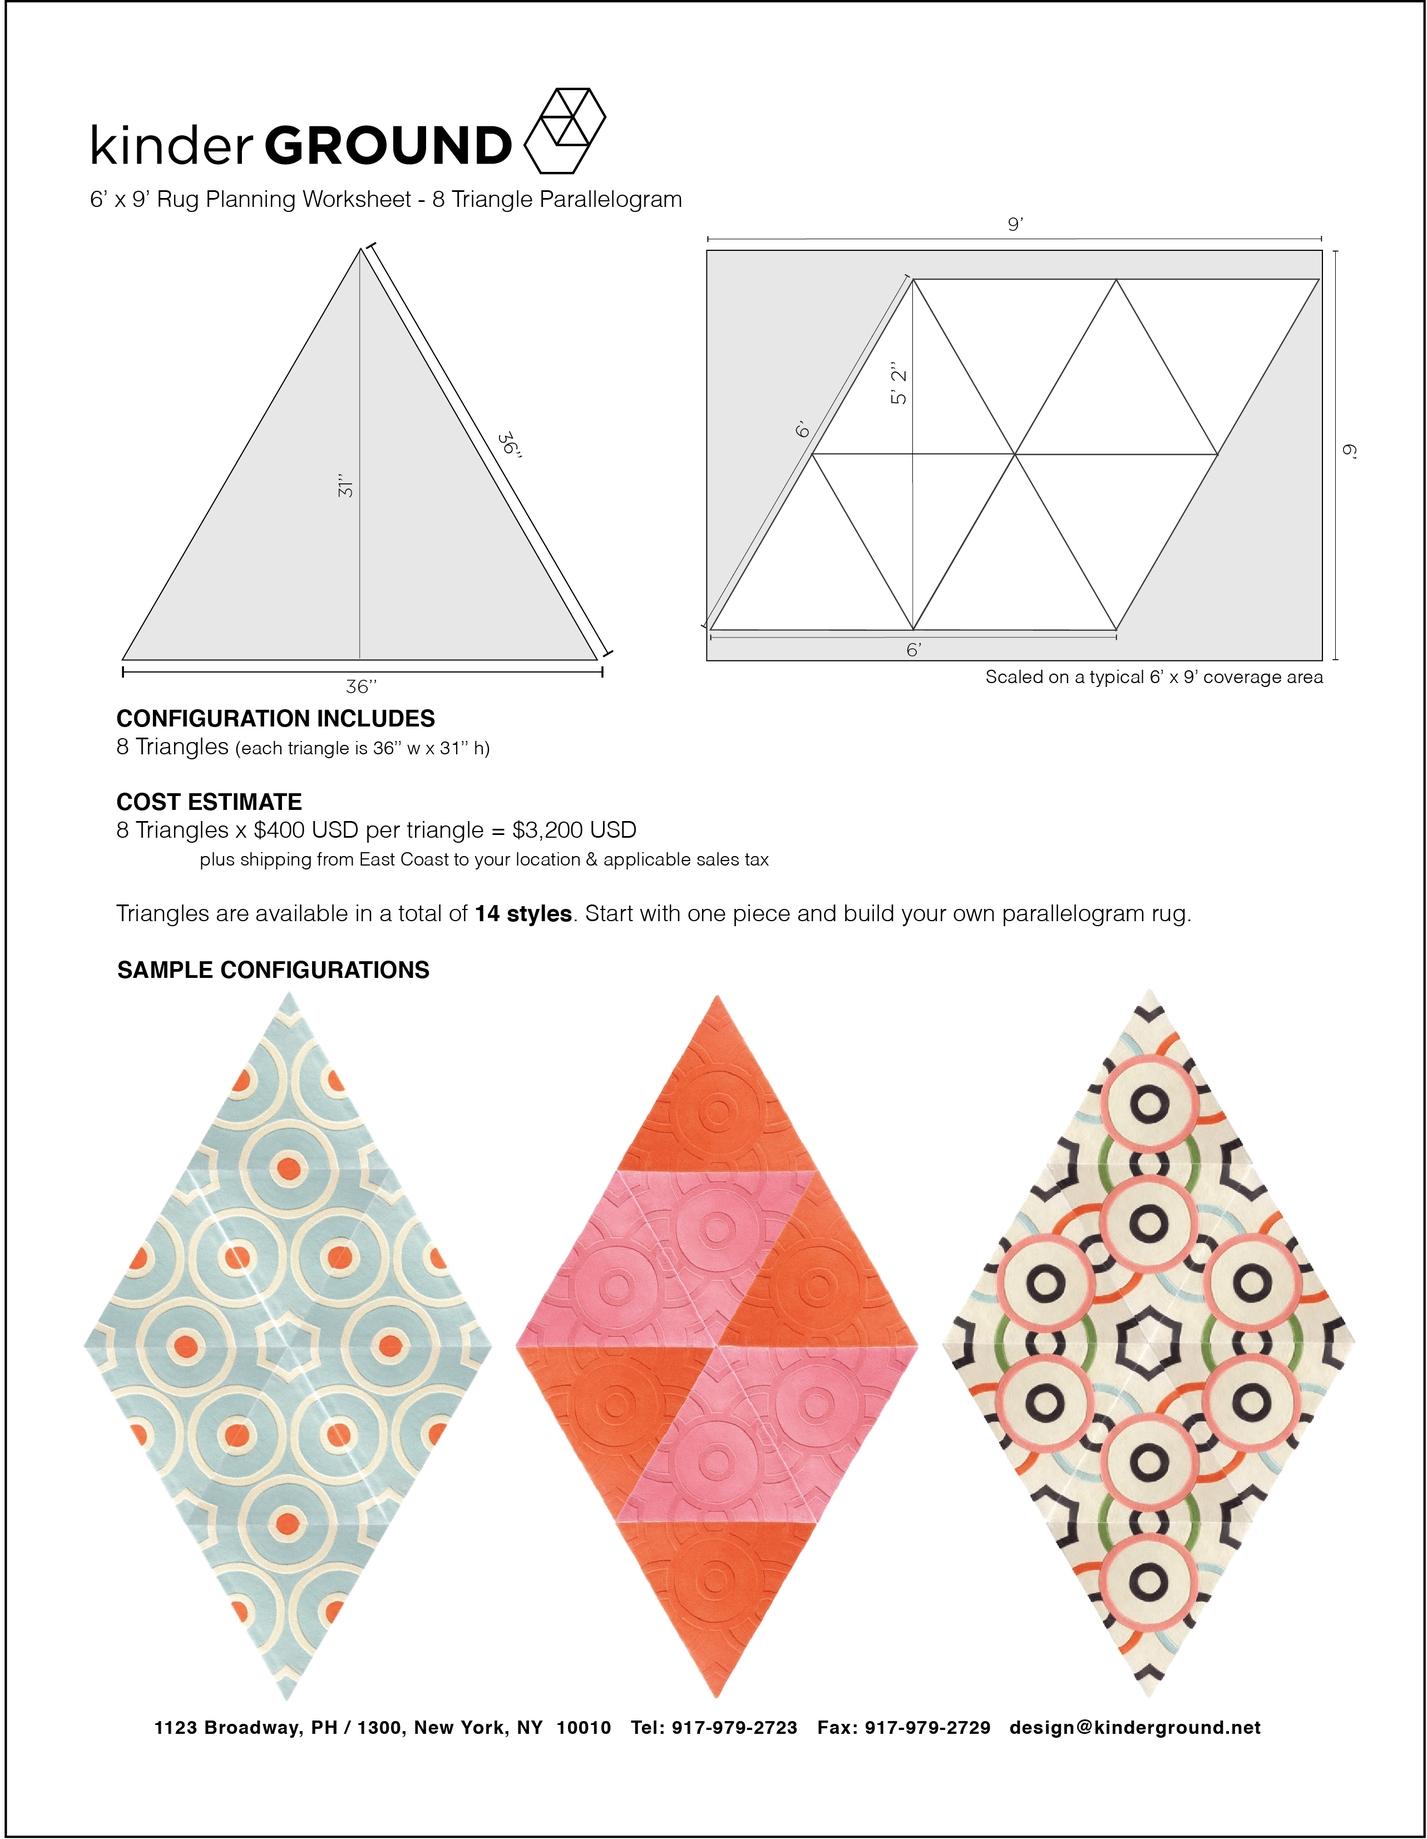 8-Triangle Parallelogram